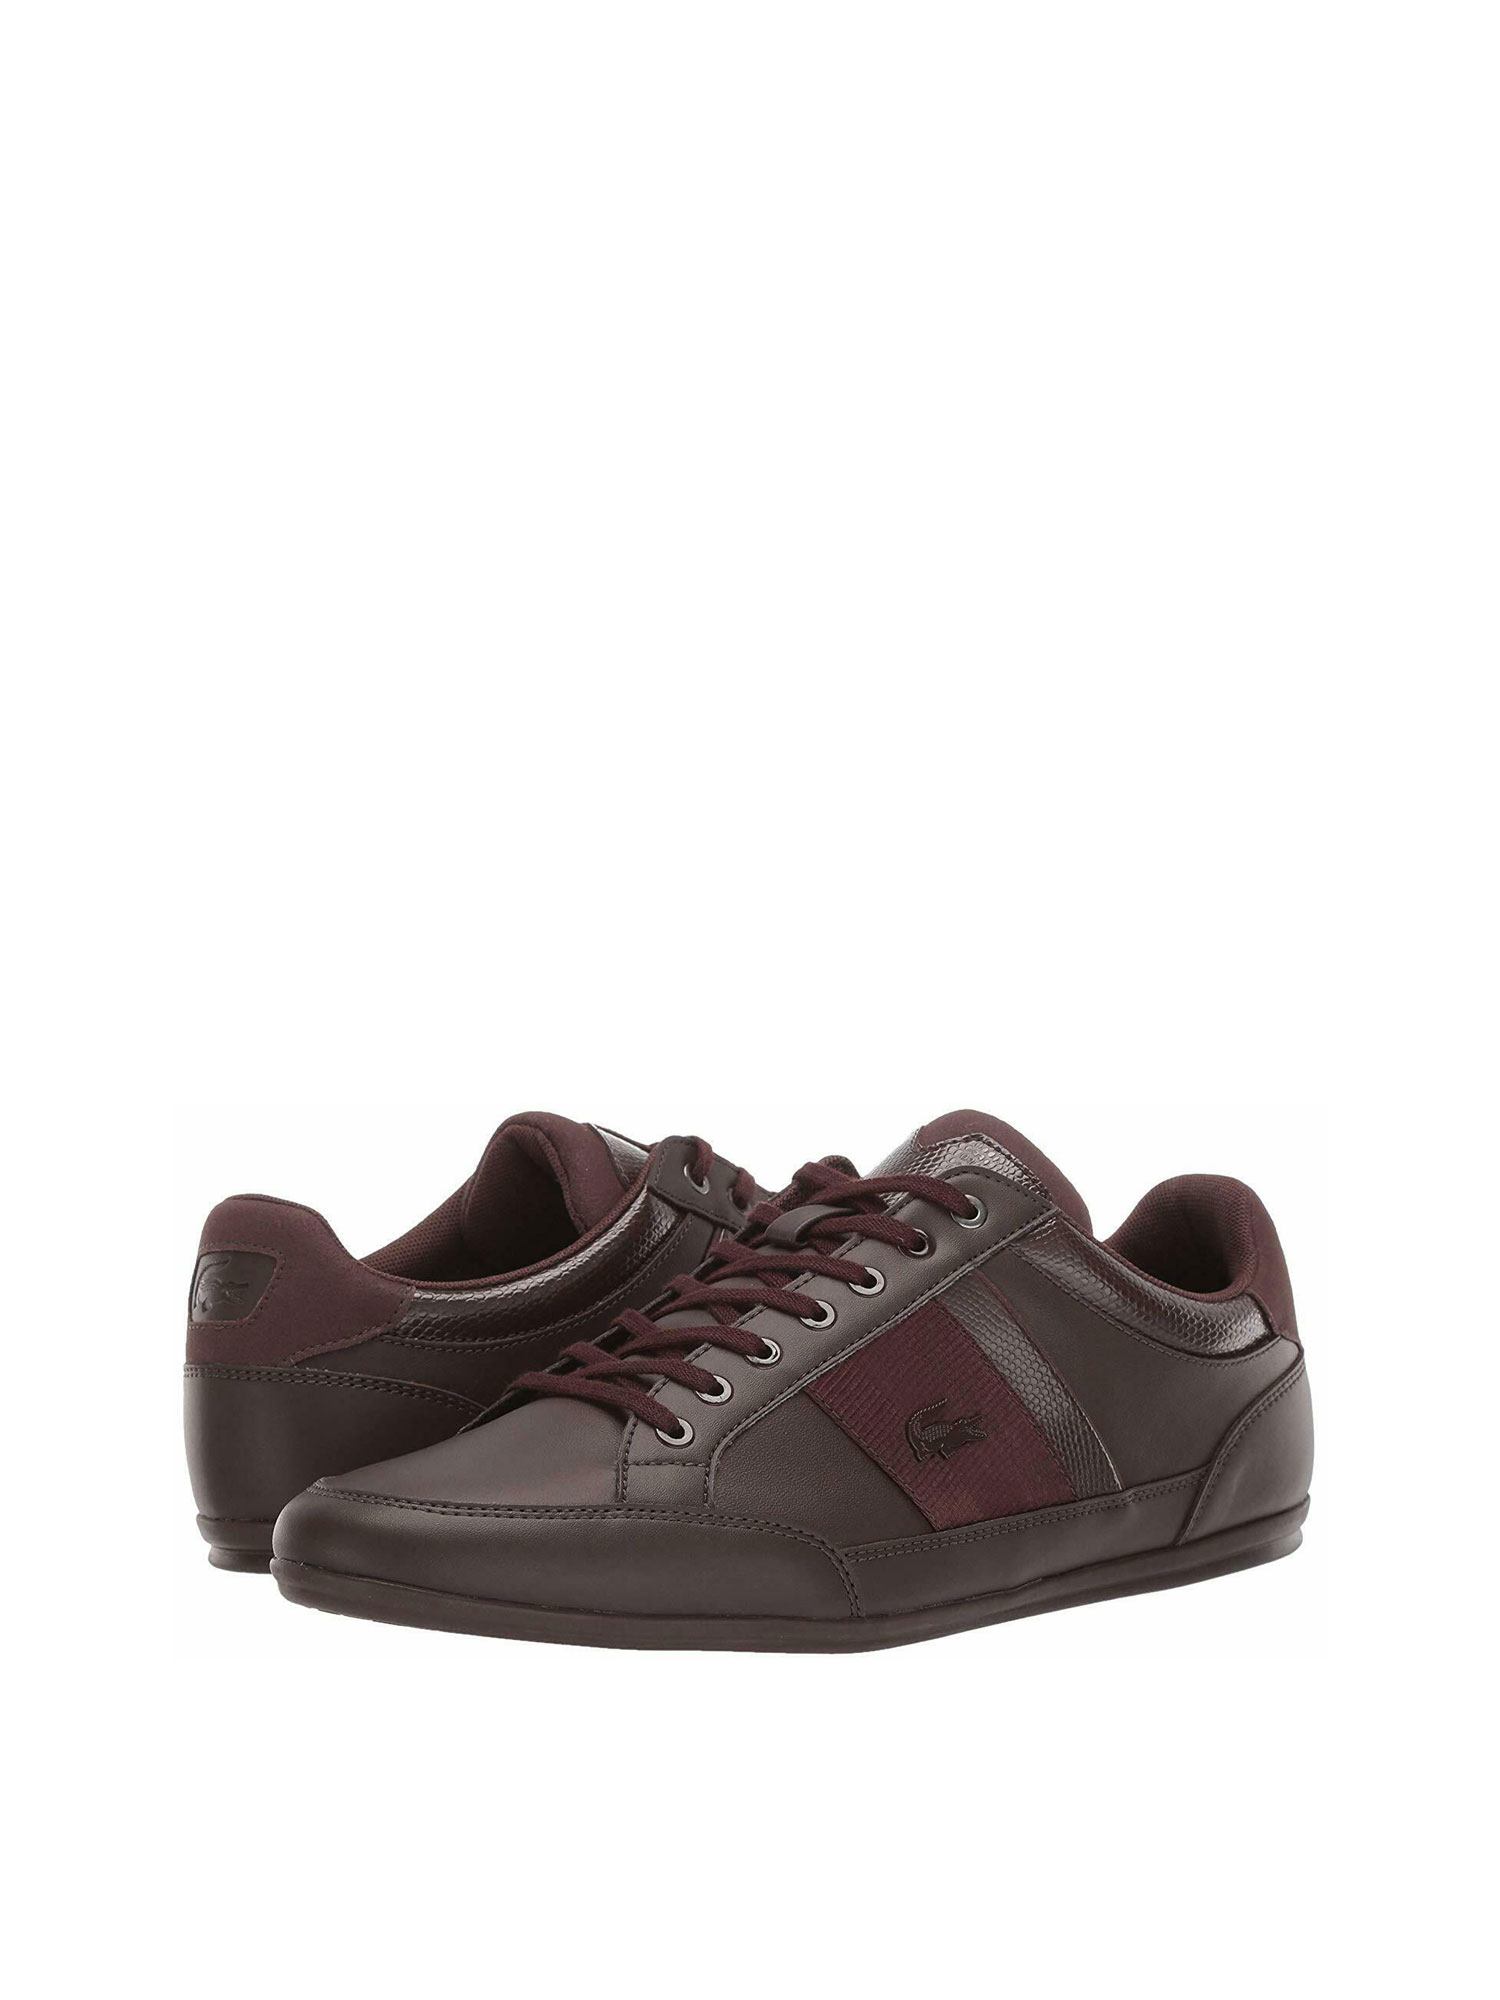 Lacoste CHAYMON 119 2 CMA Men's Fashion Sneakers